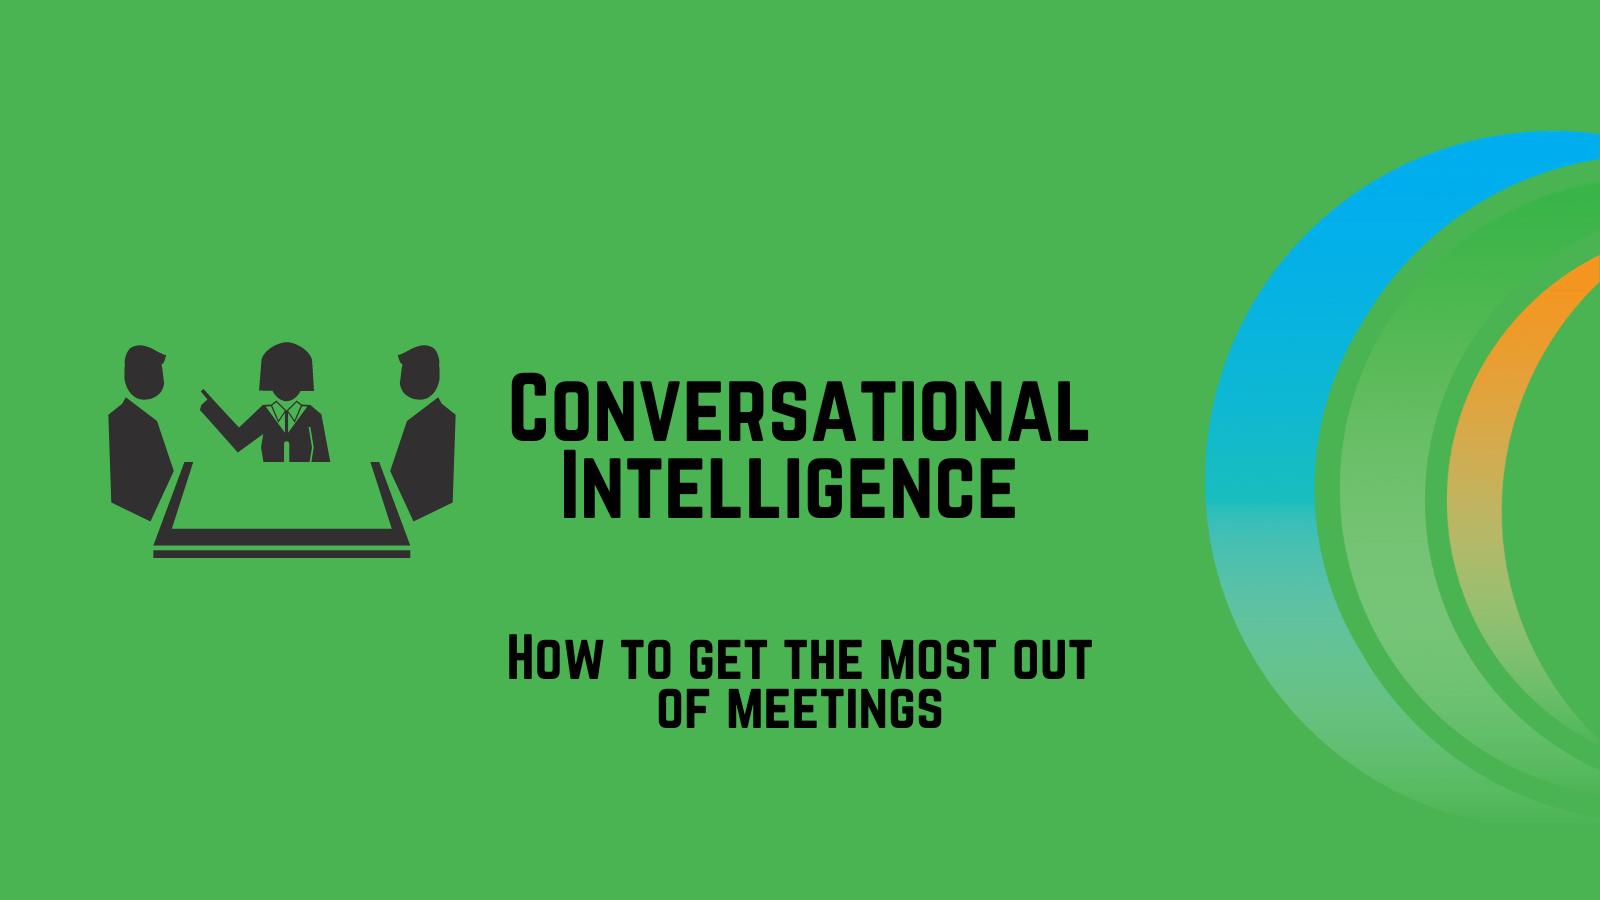 conversational-intelligence-blog